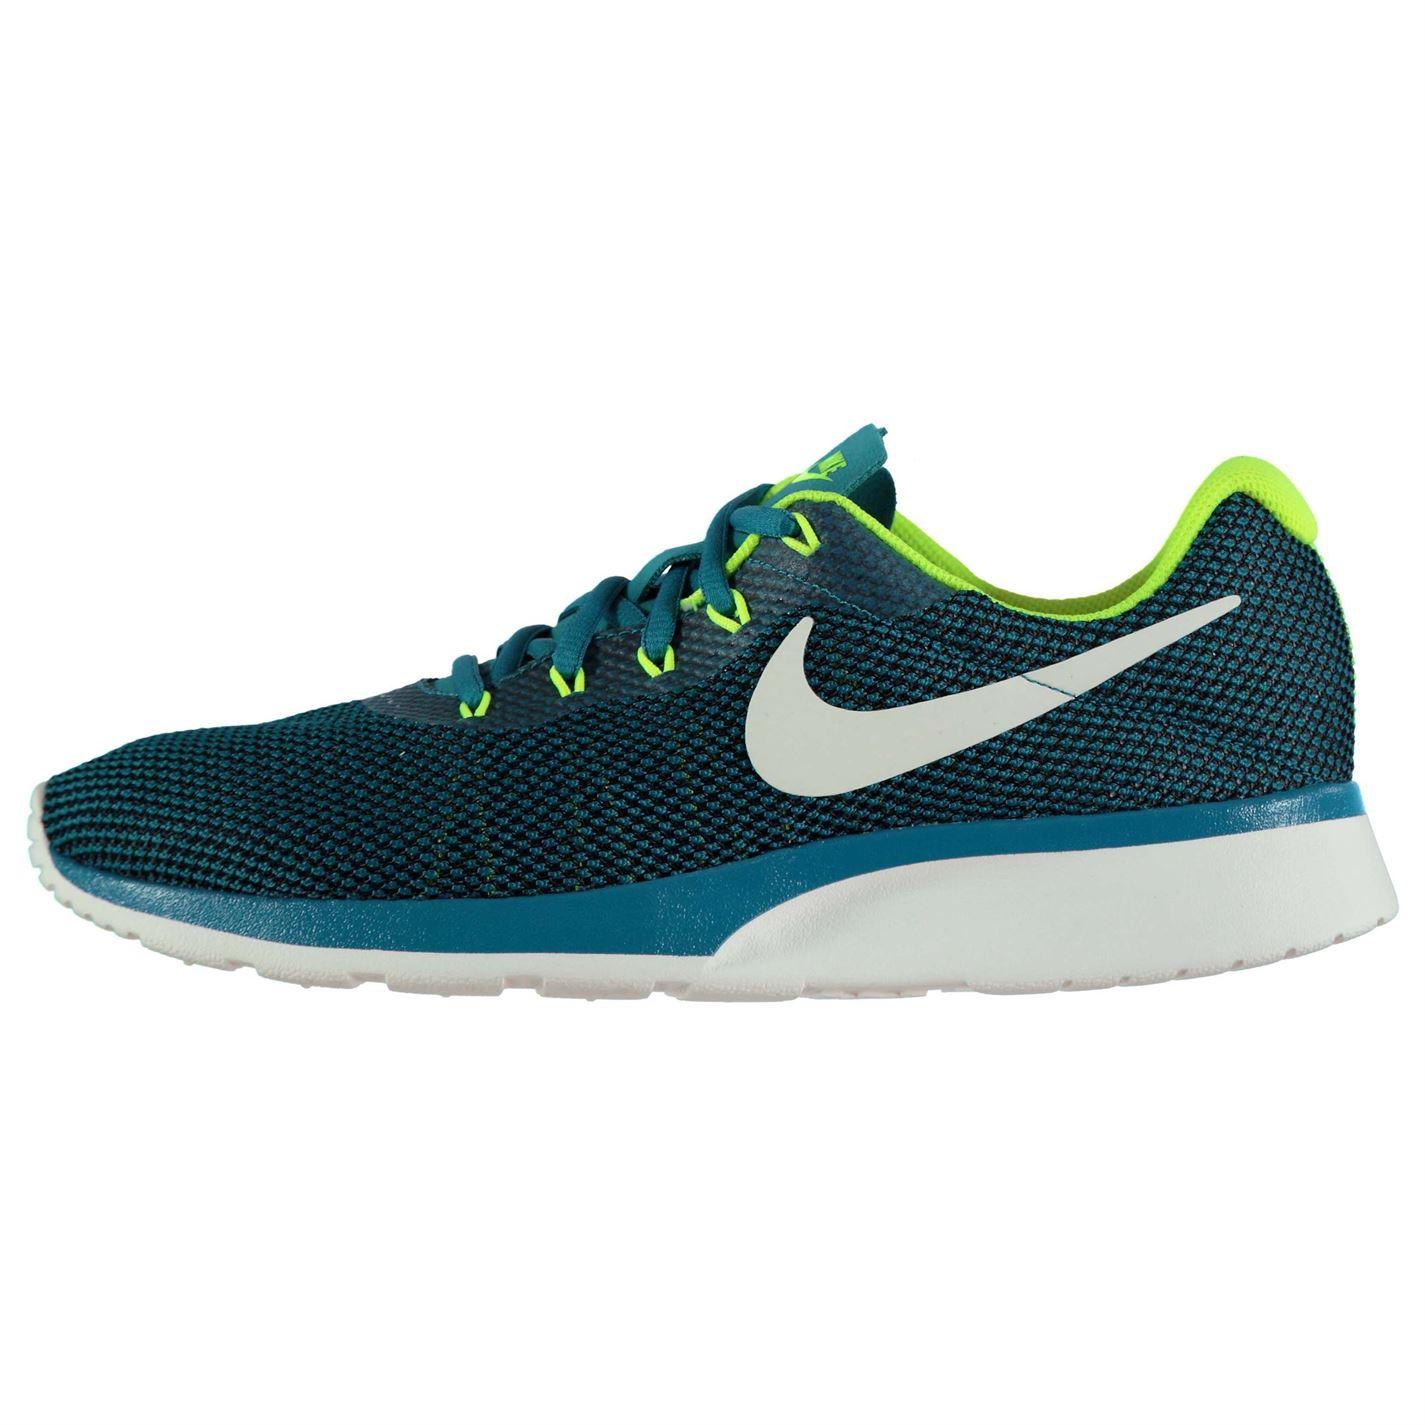 Pánske tenisky Nike Tanjun Racer Trainers Mens - Glami.sk 286d5f55b73